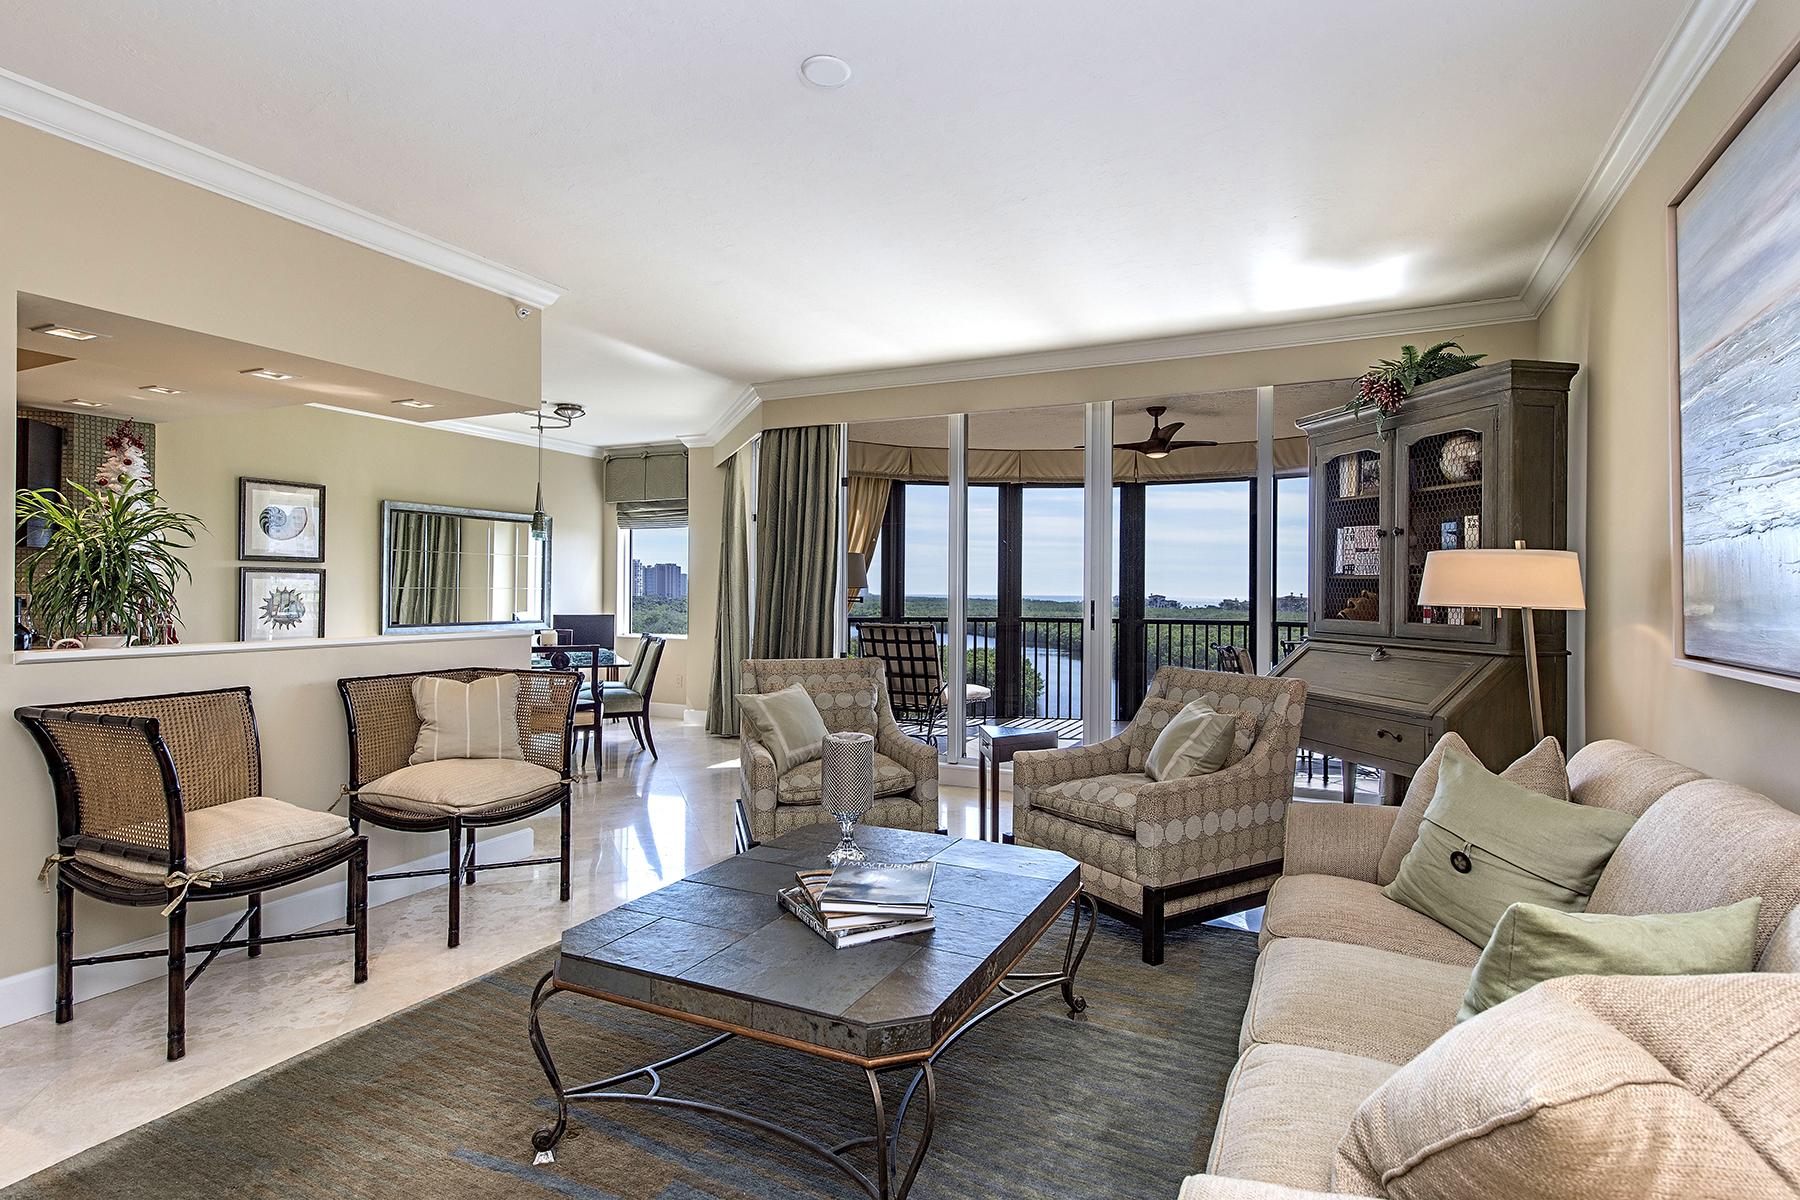 Condominium for Sale at PELICAN BAY - MARQUESA AT BAY COLONY 8990 Bay Colony Dr 602 Naples, Florida 34108 United States